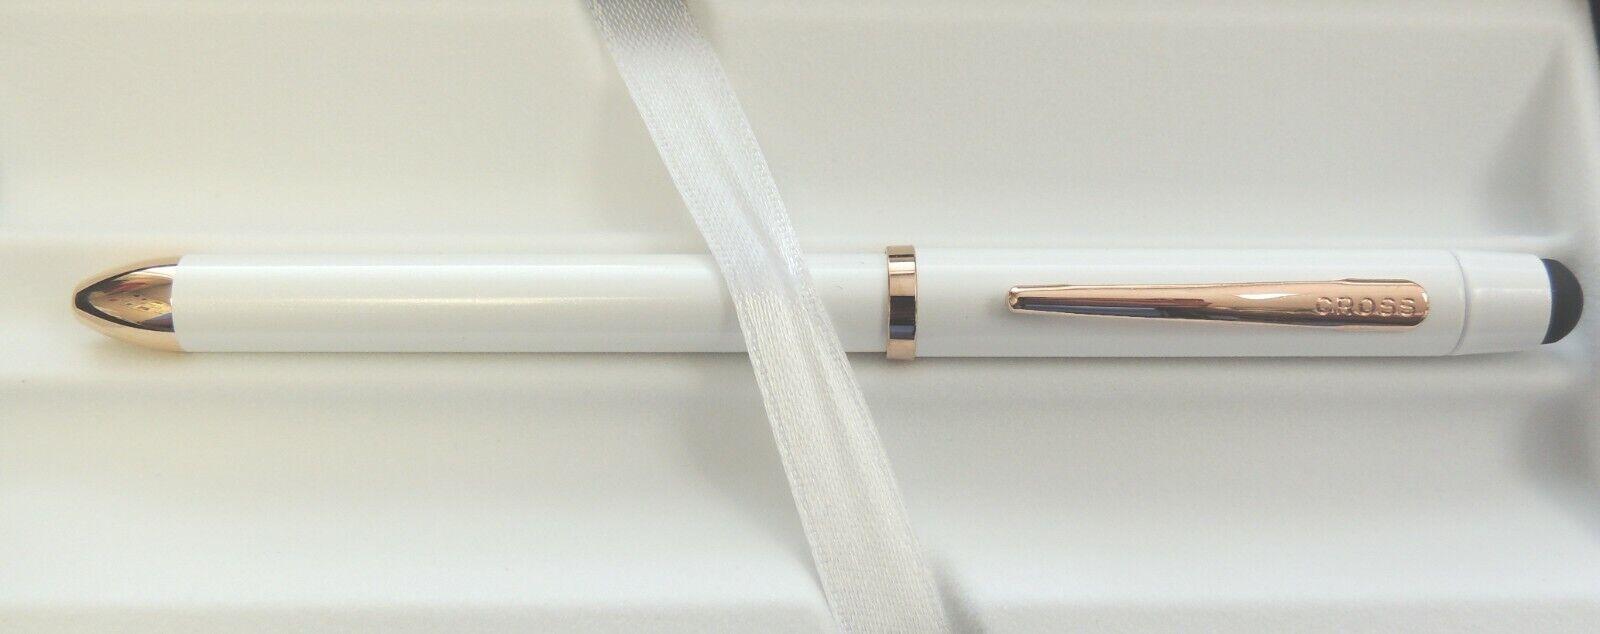 Cross Tech3+ Multi-Function Pen, Pearl White w/ Gold Trim, New in Box Ballpoint Pens